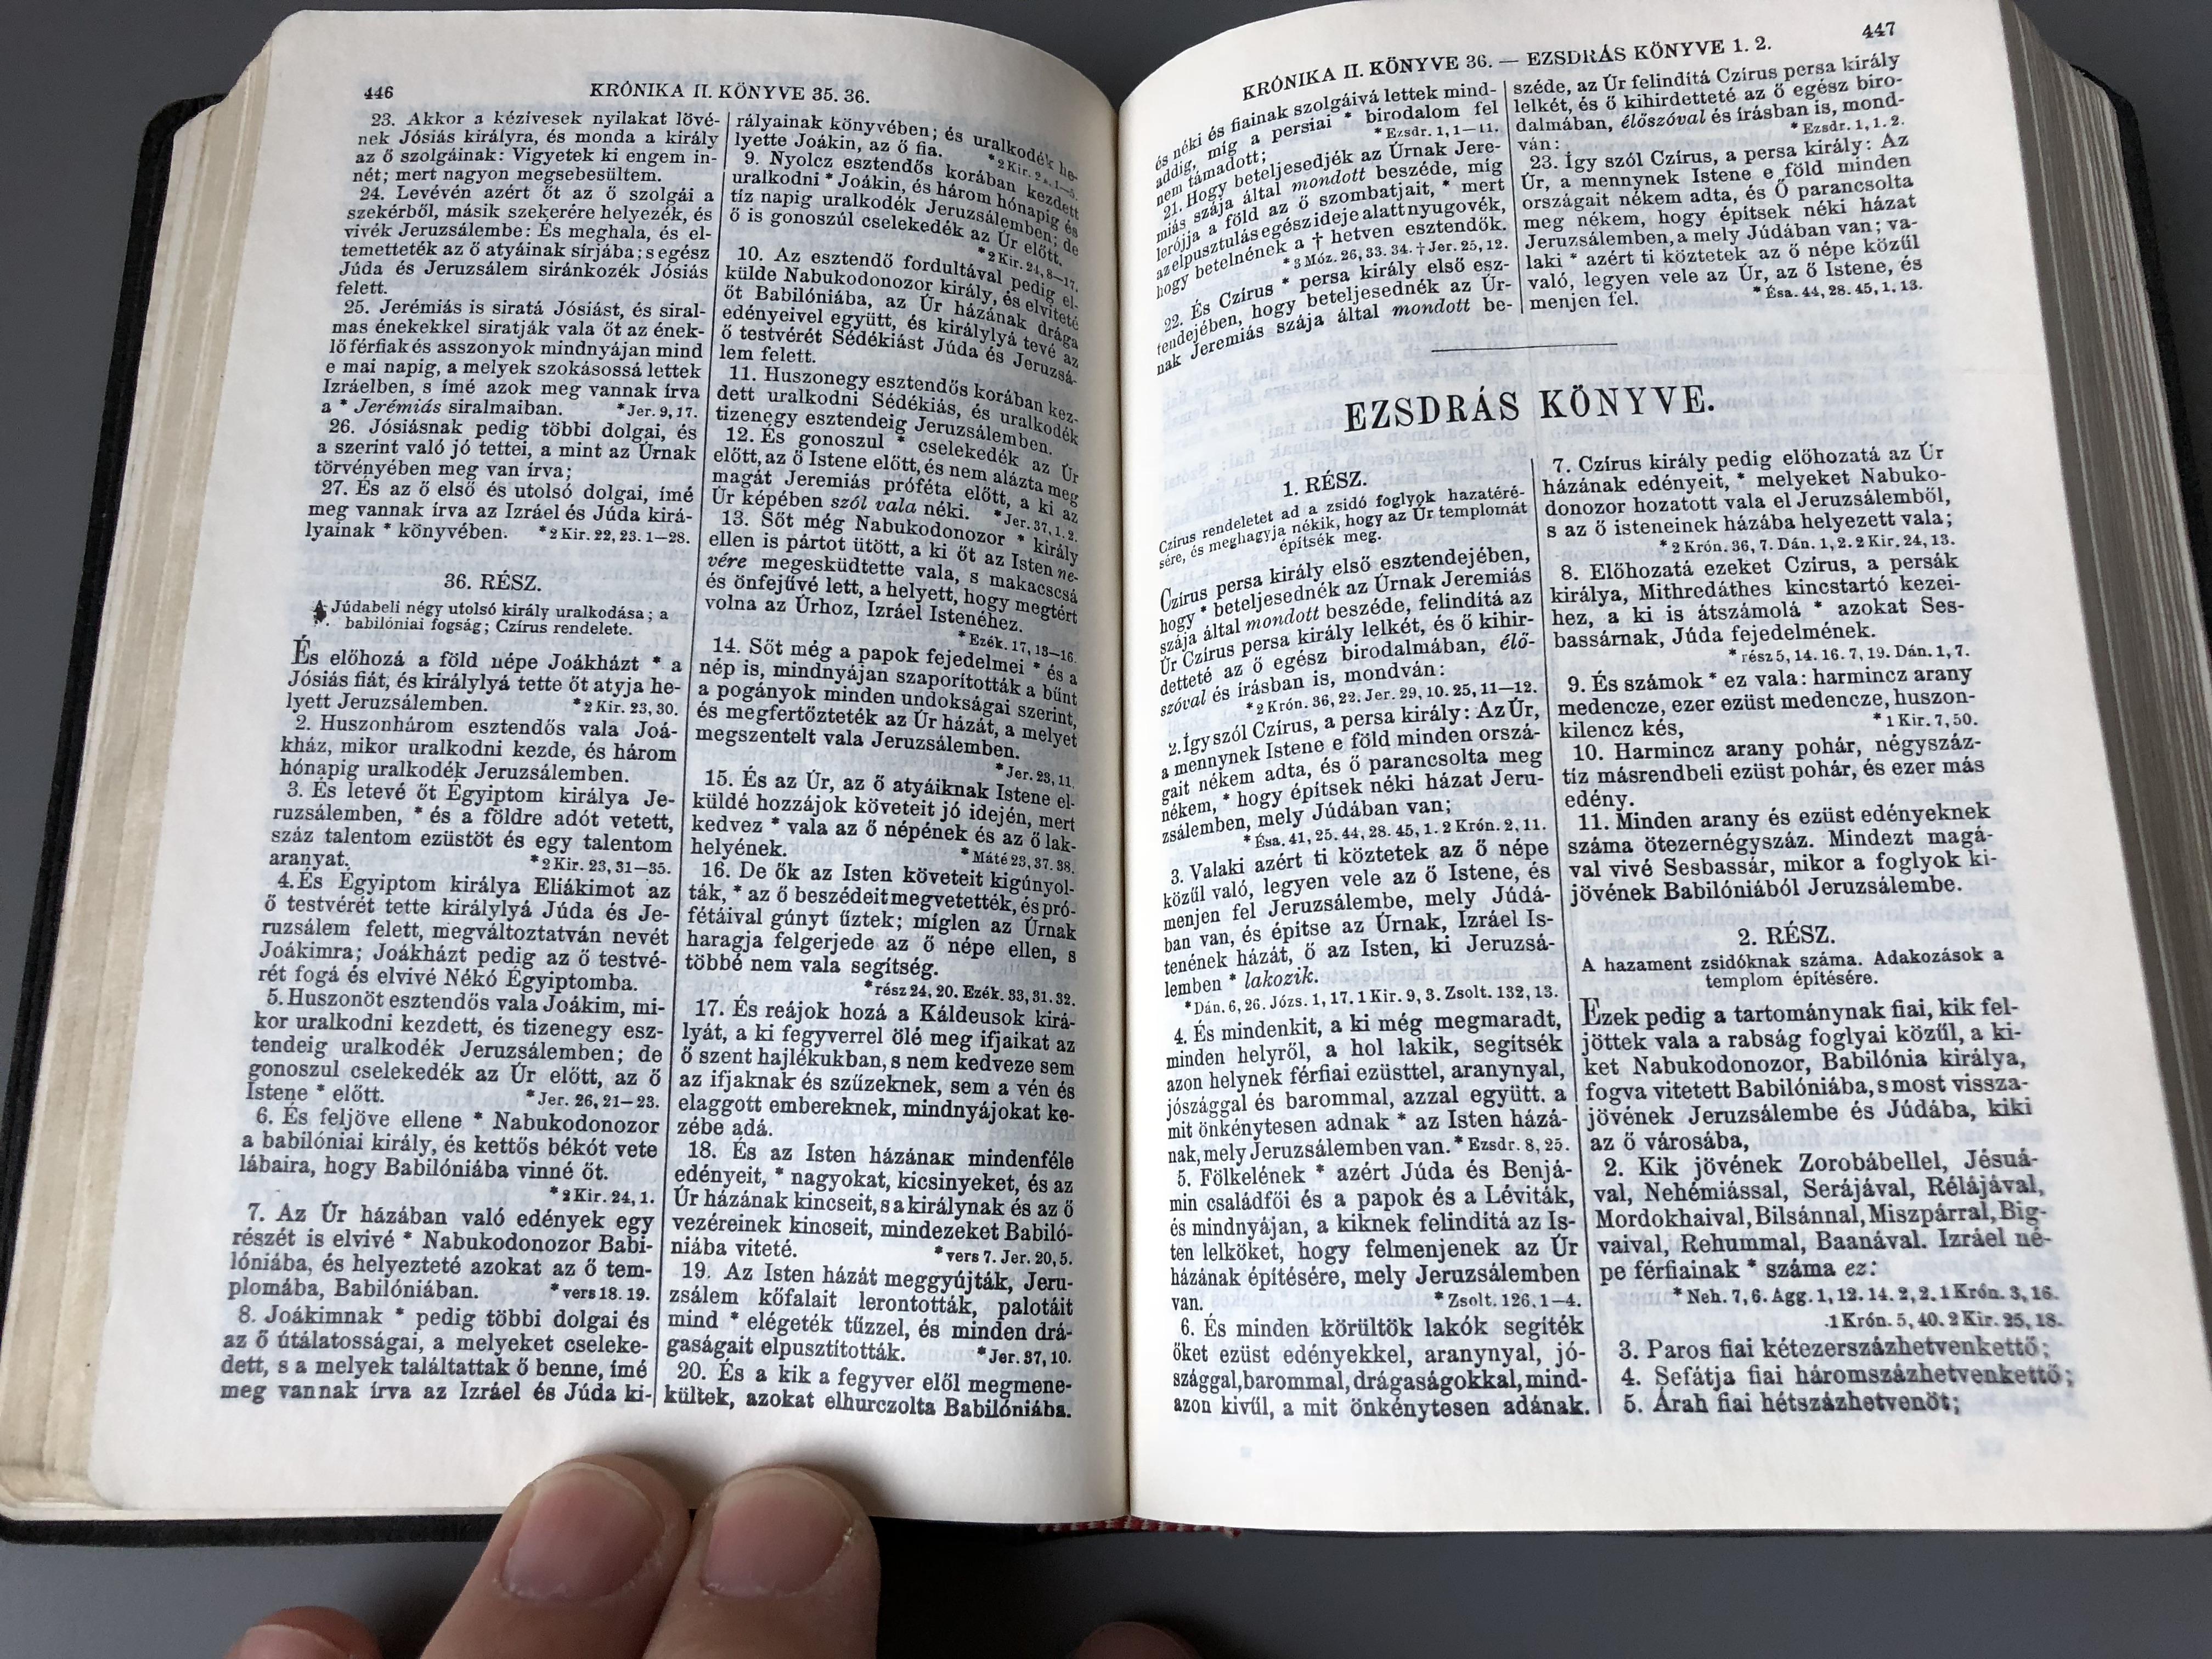 hungarian-bible-1950-szent-biblia-k-rolyi-g-sp-r-revised-hungarian-version-text-1908-8-.jpg